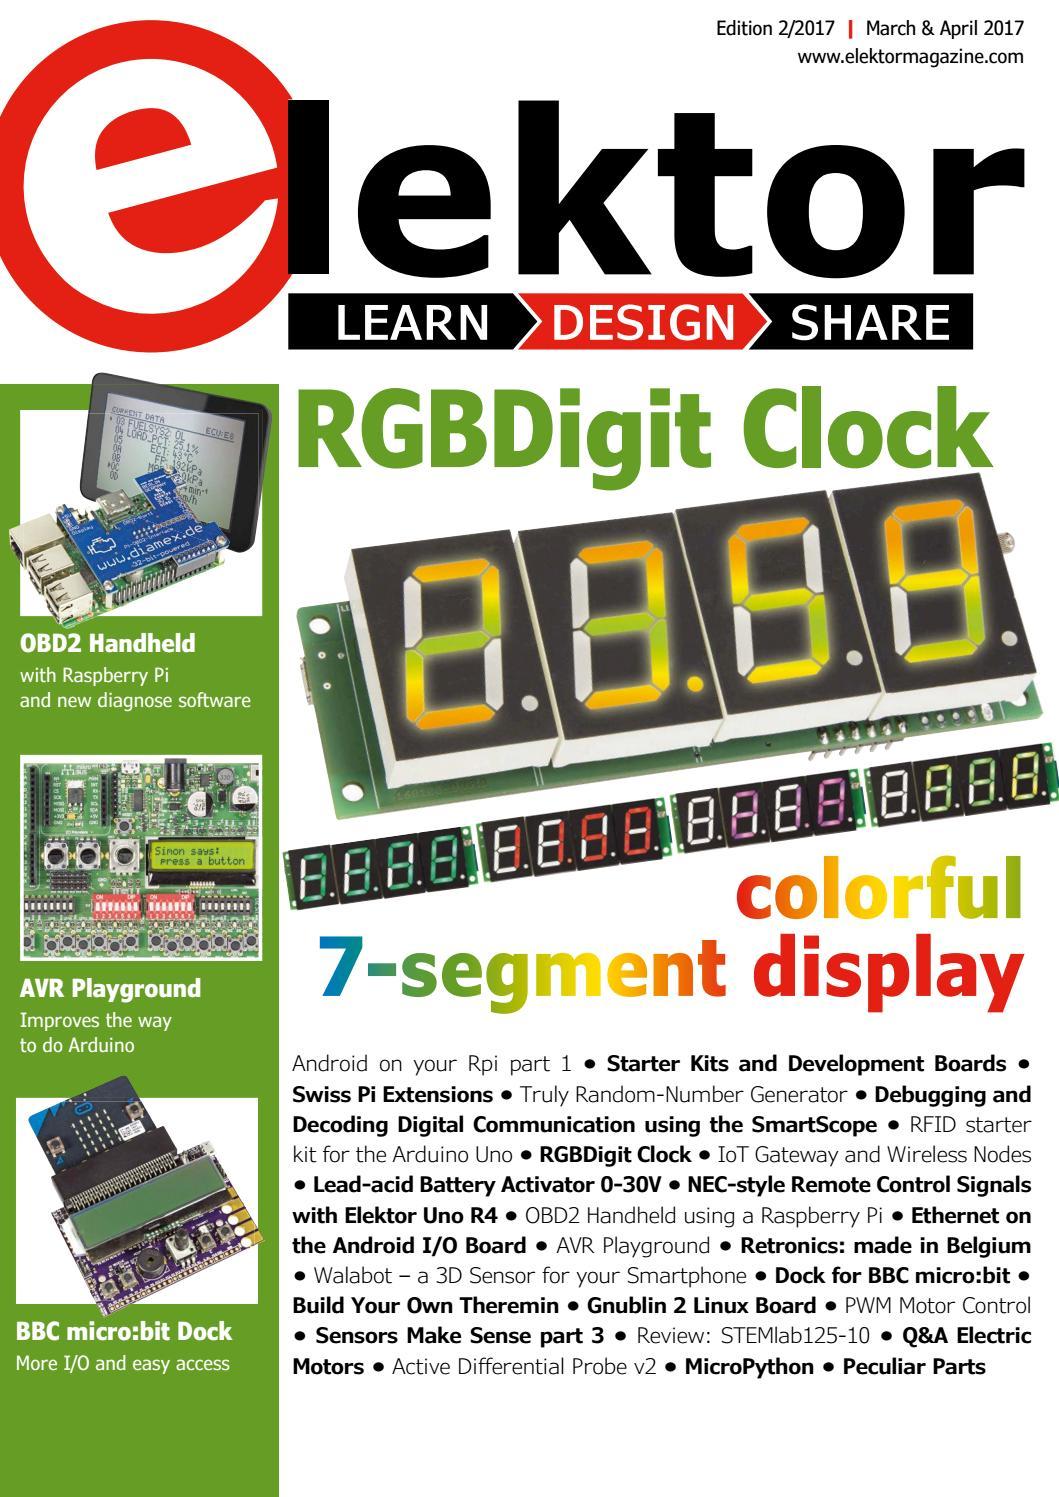 Elektor Magazine Edition 2 2017 By Issuu Circuit Diagram Of 7segment Display Interfacing To Arm Cortex M0